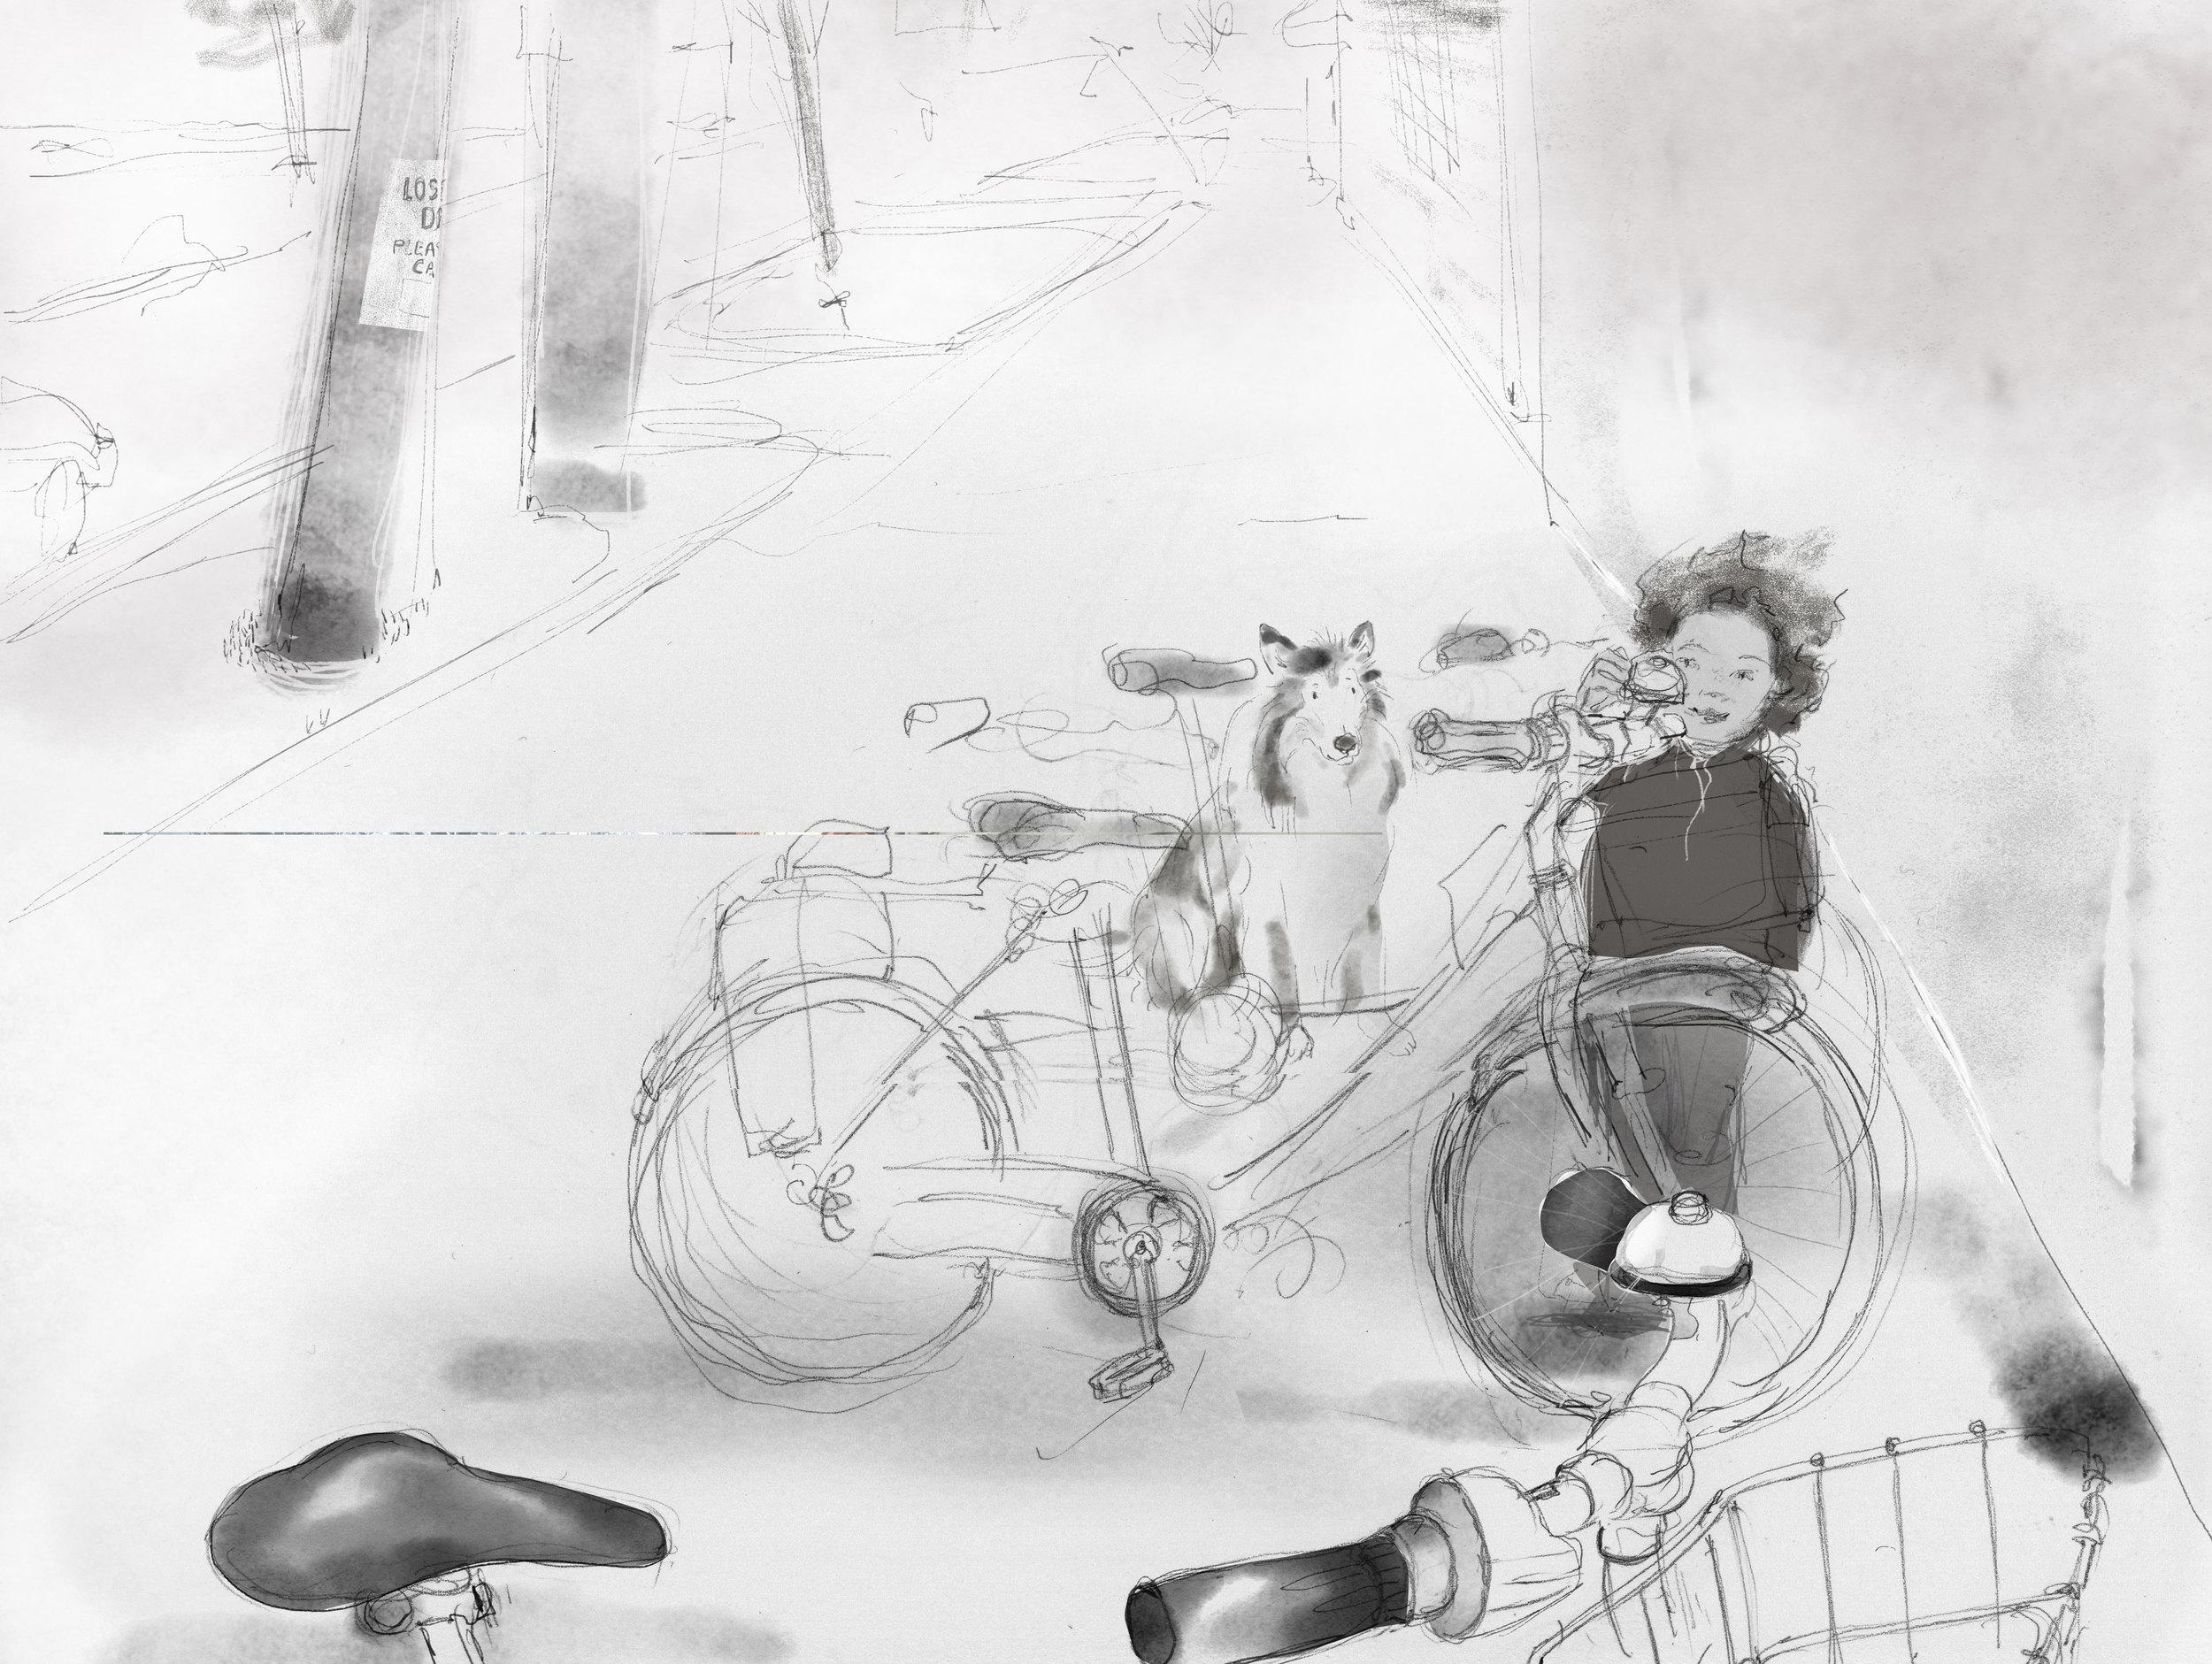 Jax-with-bikes.jpg